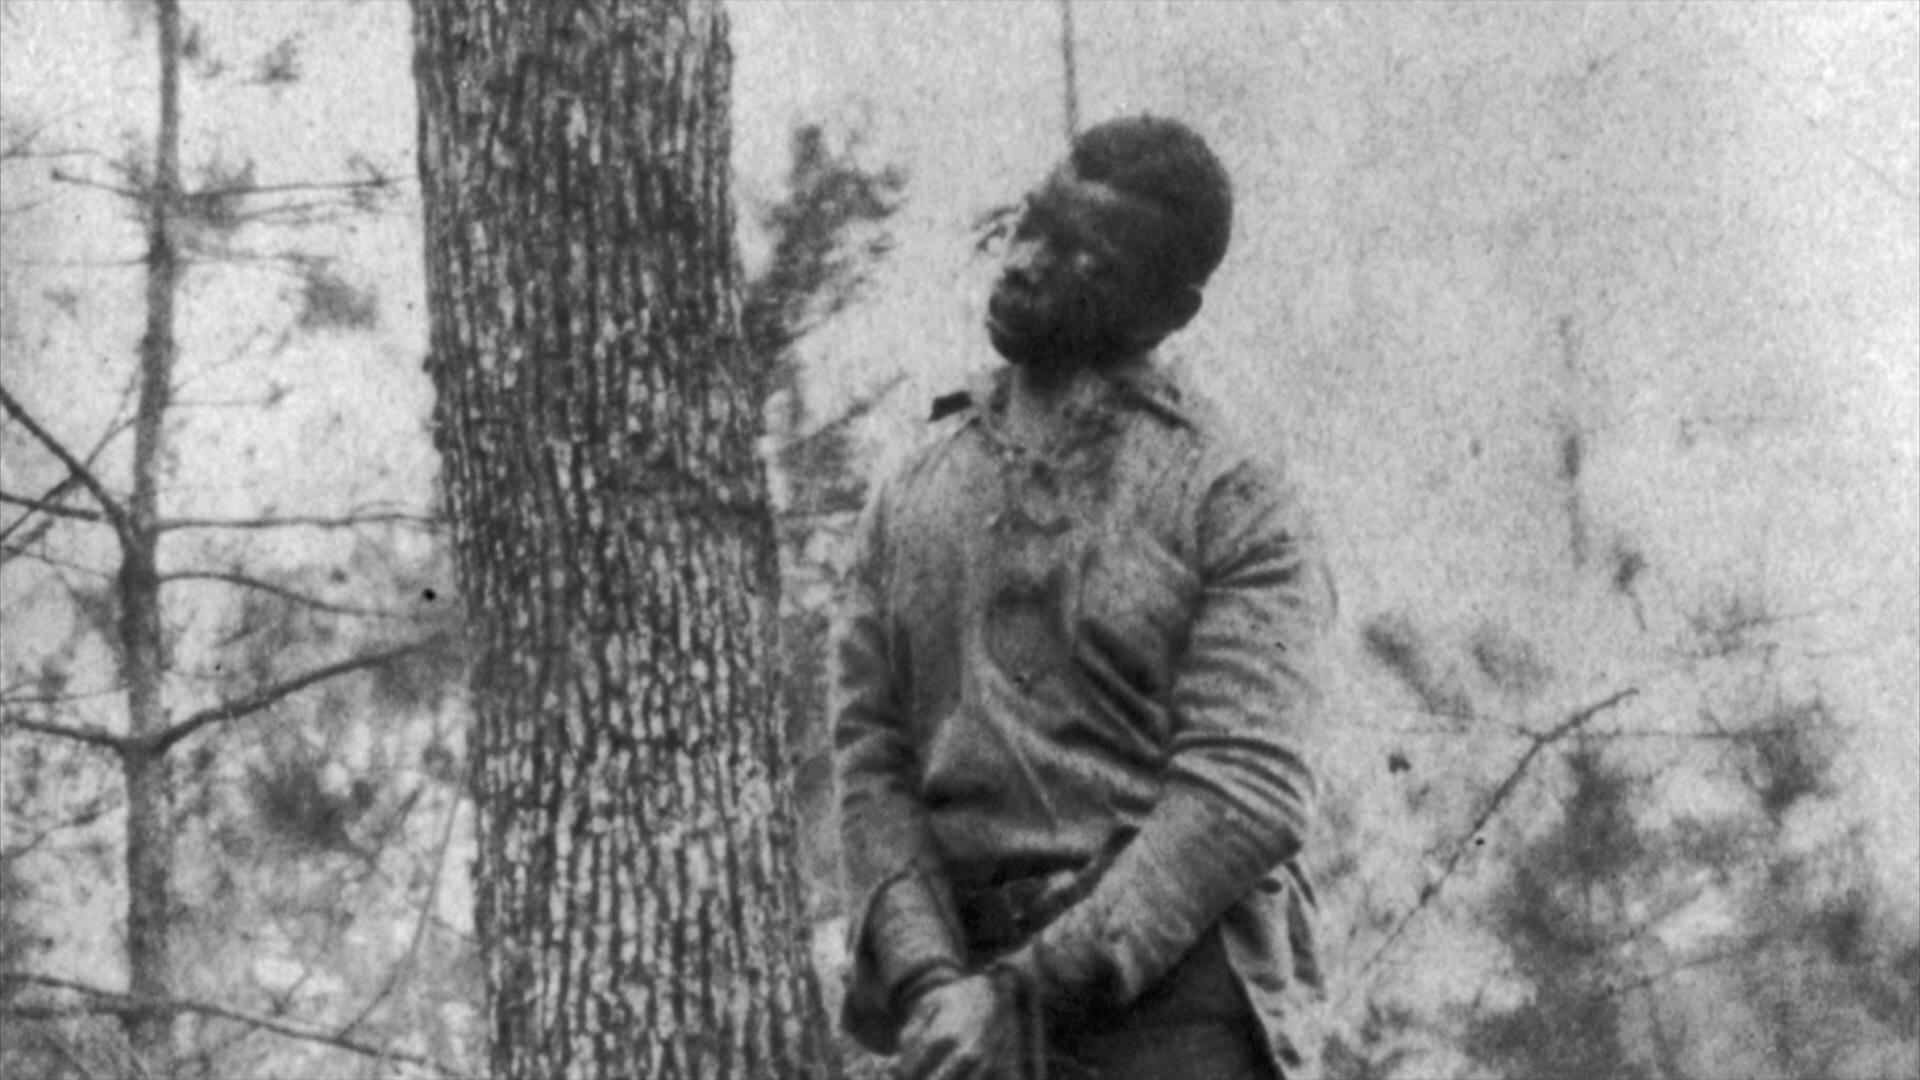 Exposing 'Southern Horrors' video thumbnail